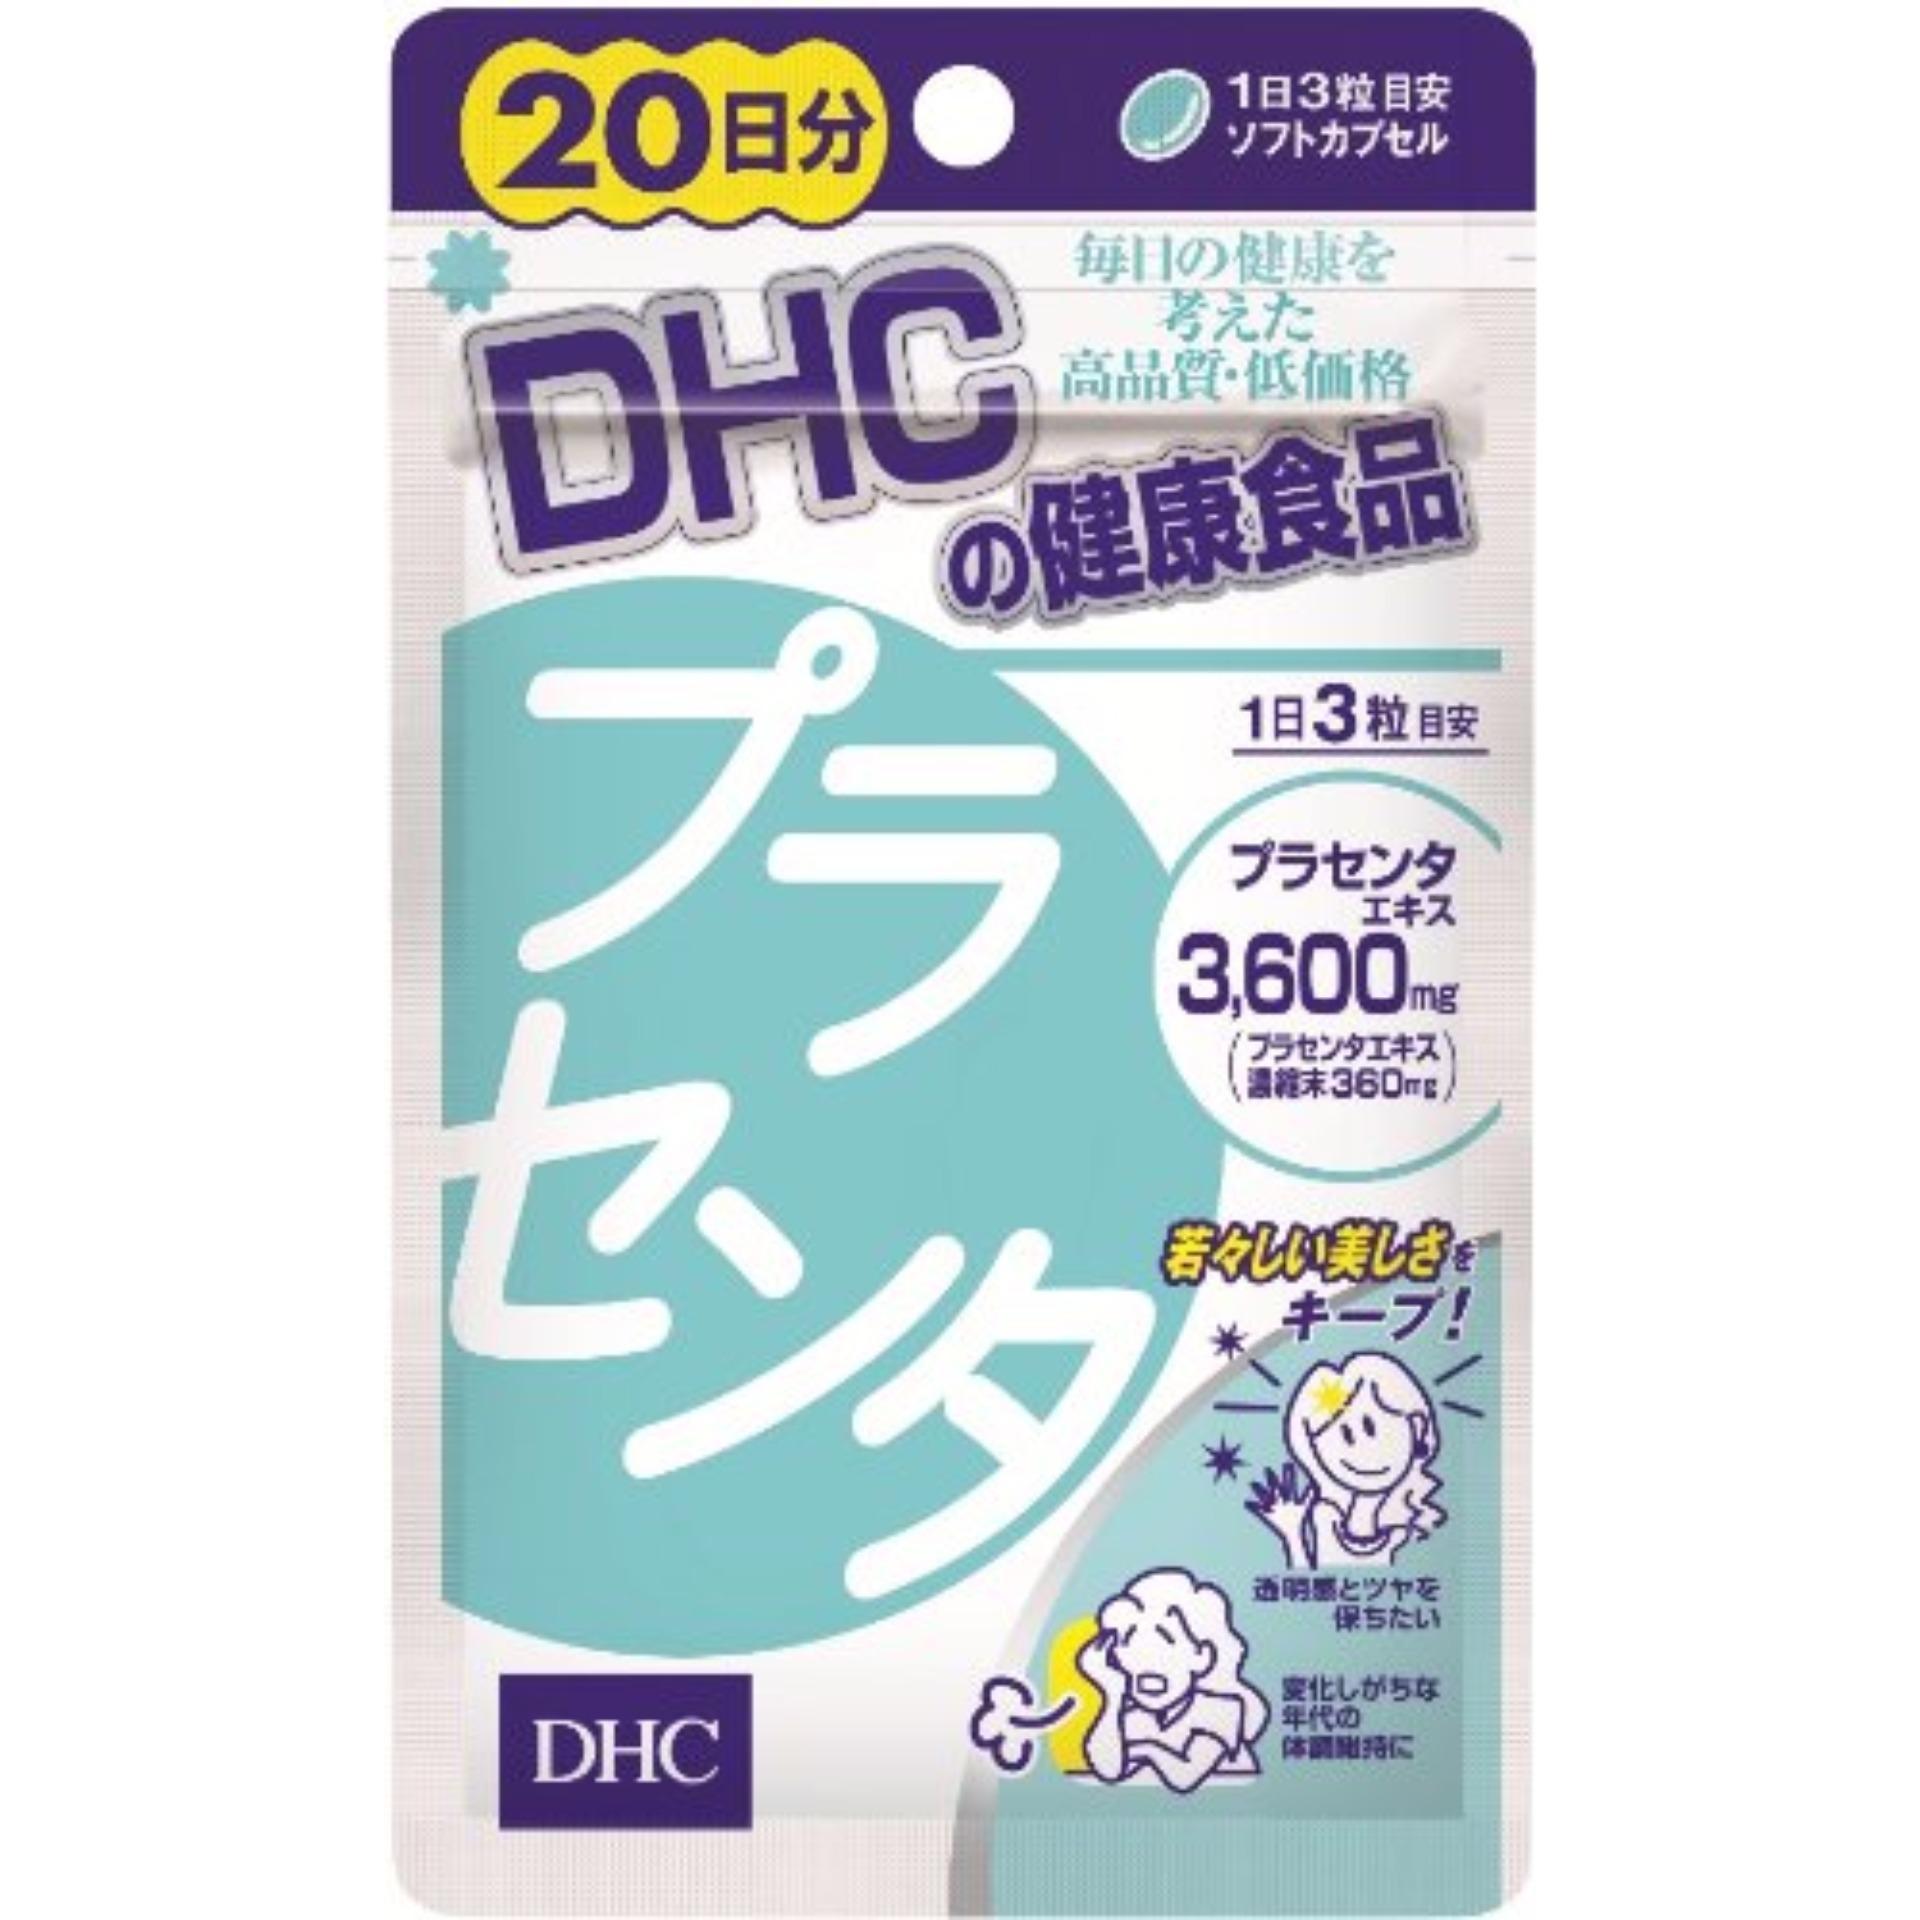 DHC PLACENTA SUPPLEMENT 20 DAYS